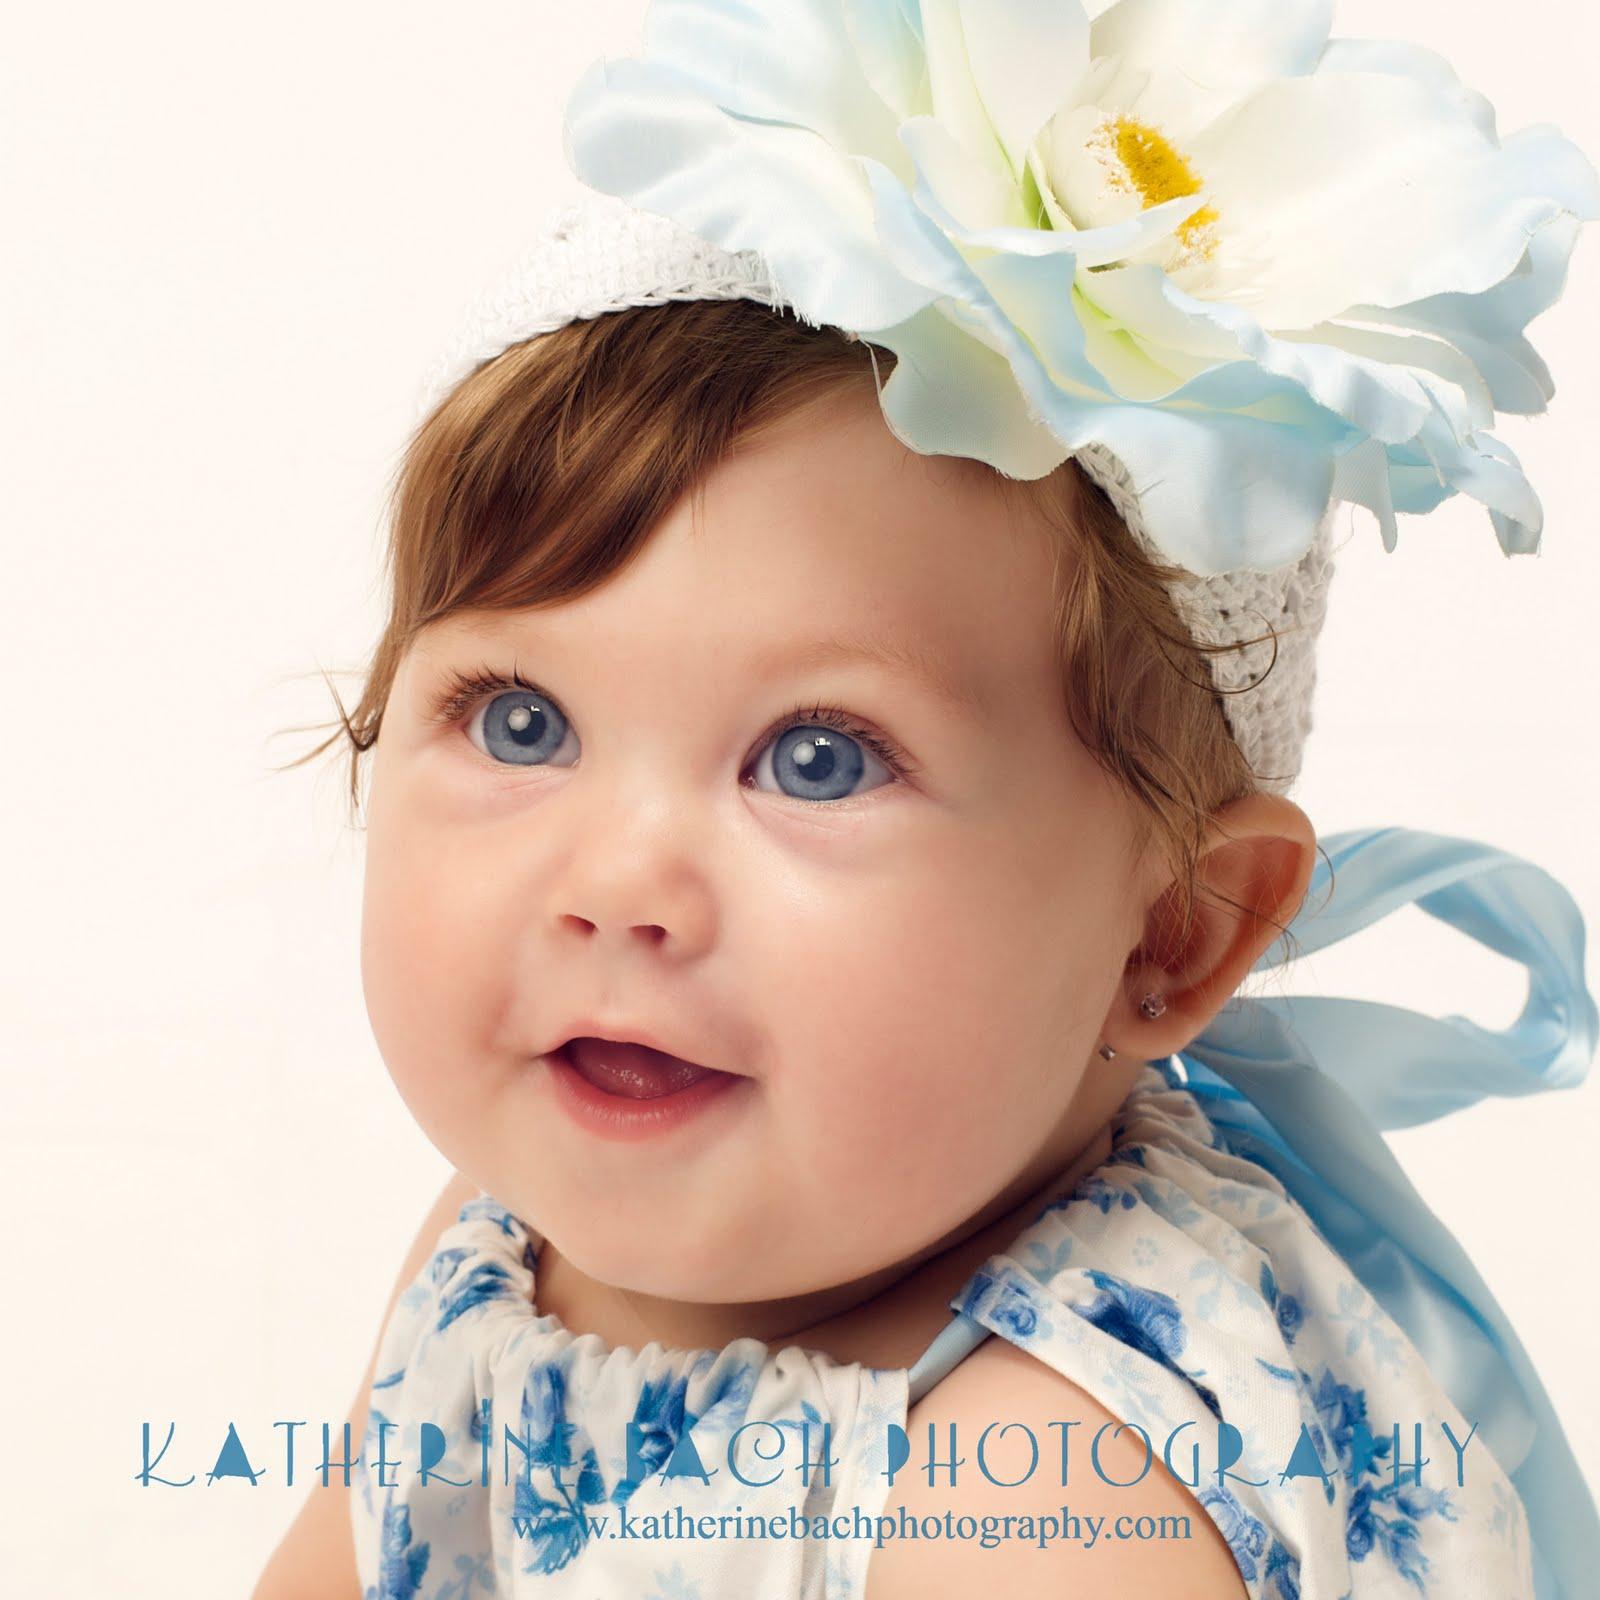 K Baby Model Katherine Bach Photogr...